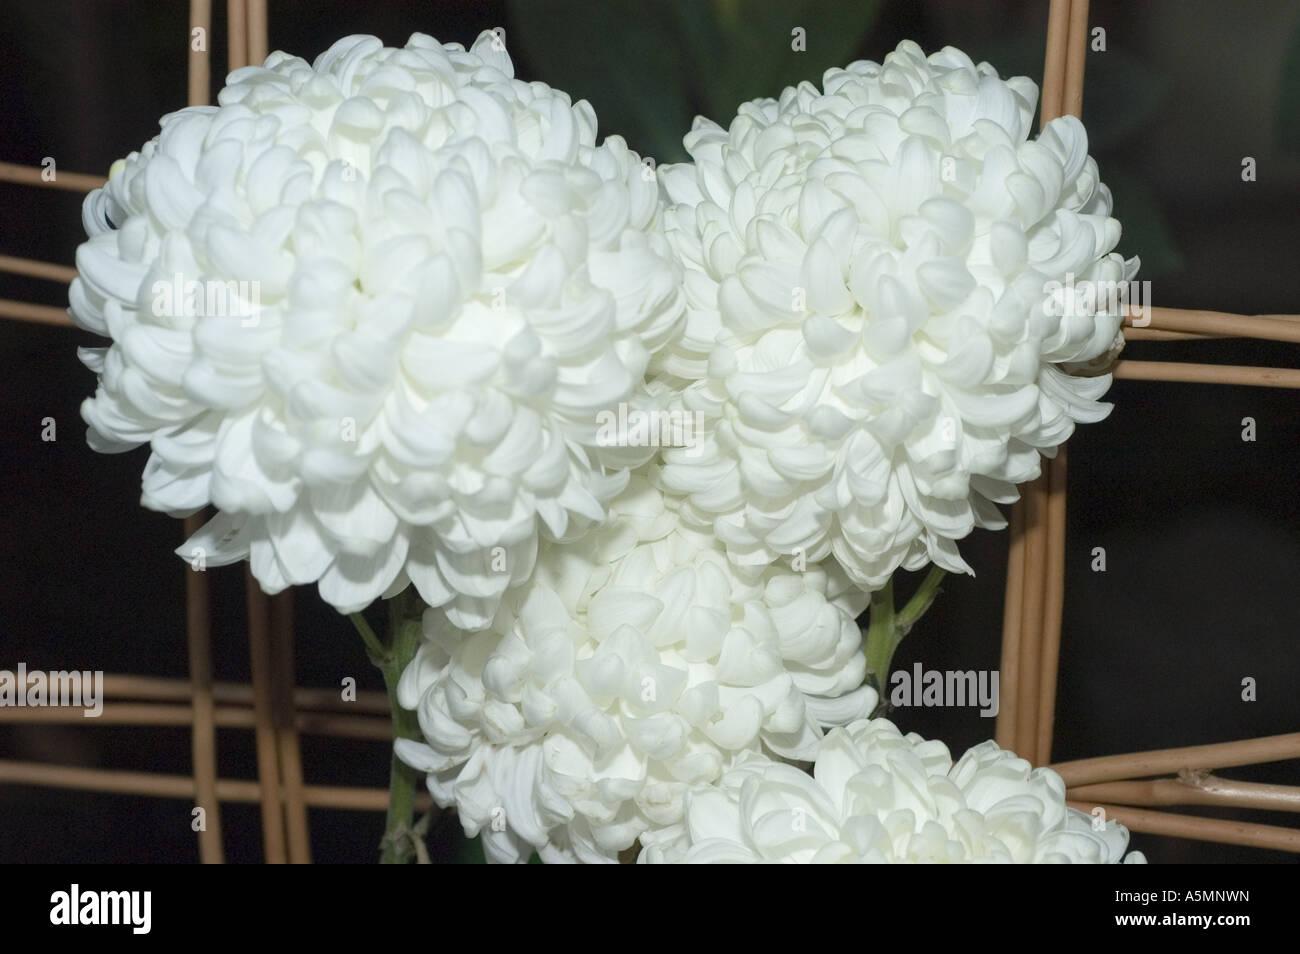 White flowers of chrysanthemum snowdon stock photo 11347136 alamy white flowers of chrysanthemum snowdon mightylinksfo